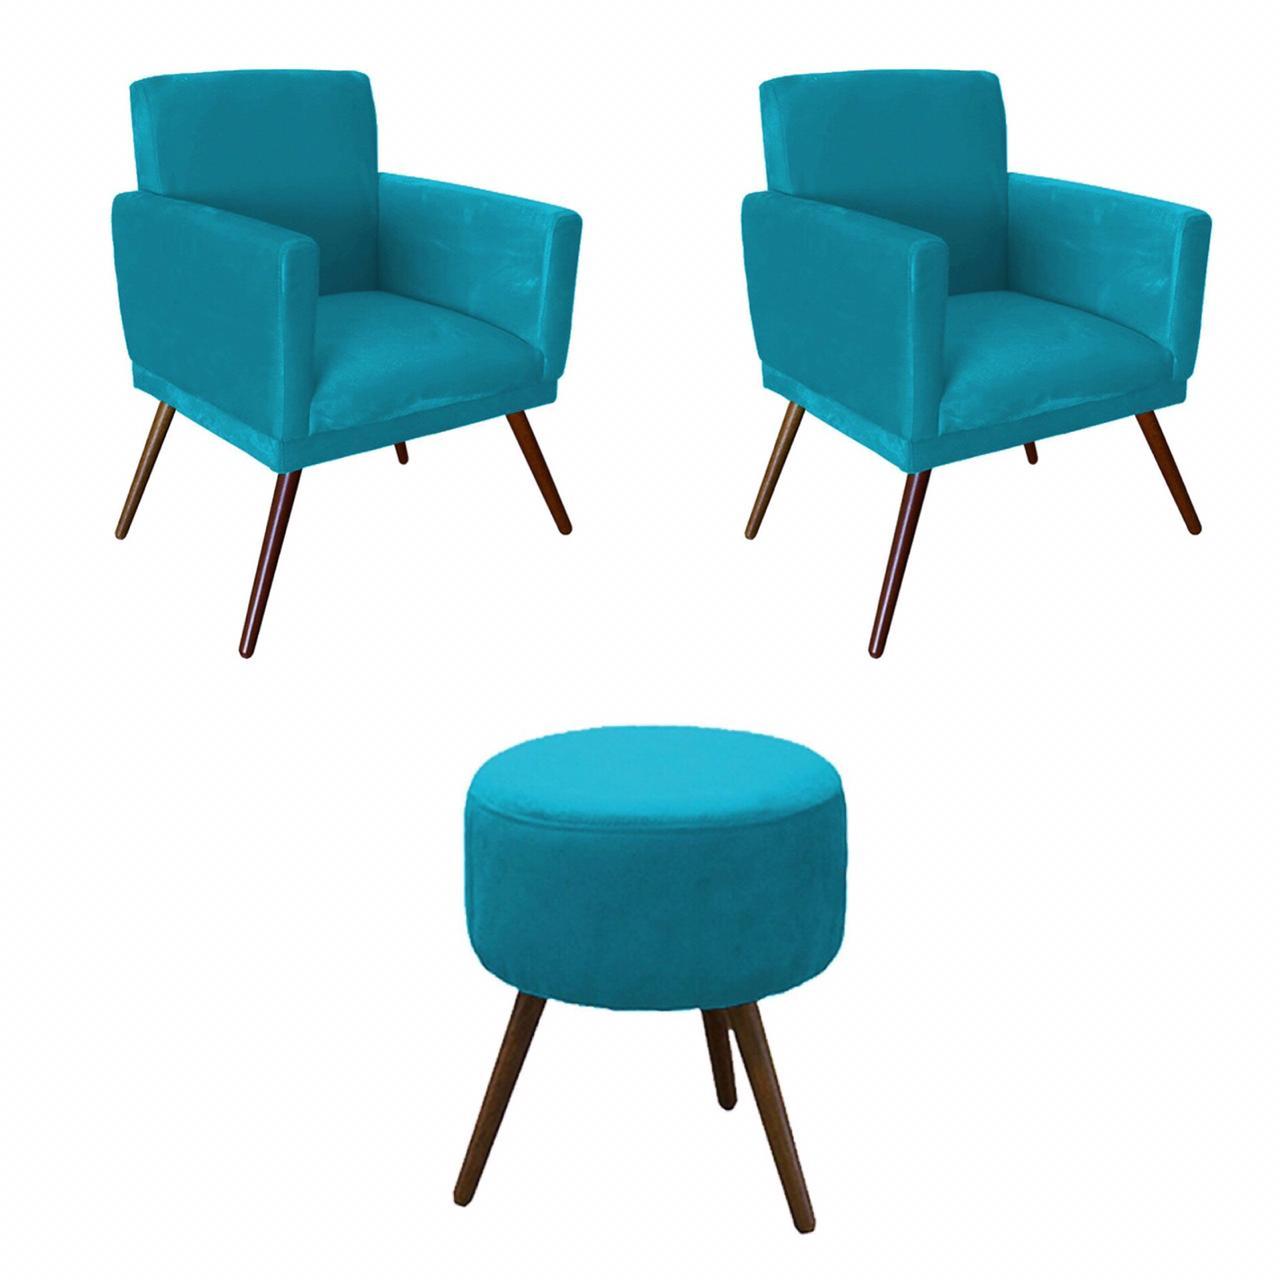 Kit 02 Poltronas Decorativa Nina com rodapé e Puff redondo Azul- Bela Casa Shop